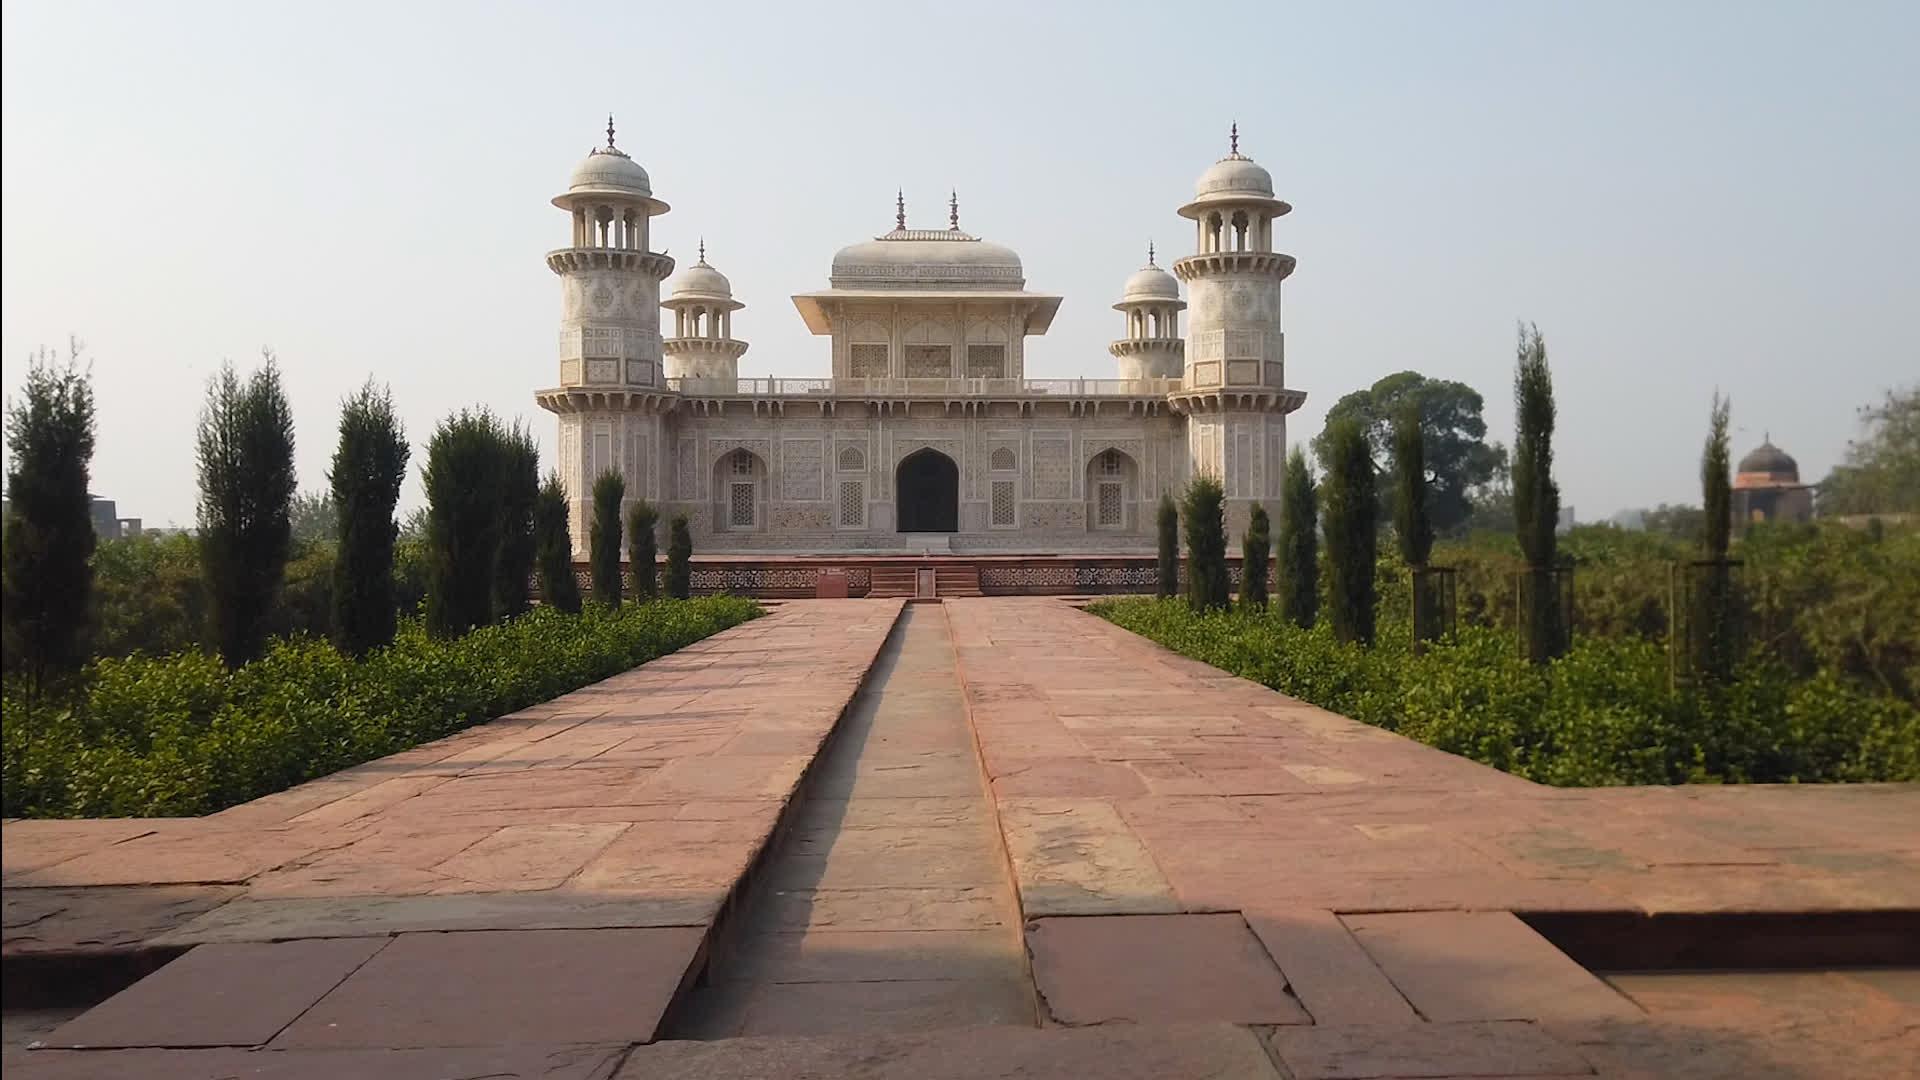 The Tomb of Itmad-ud-Daulah